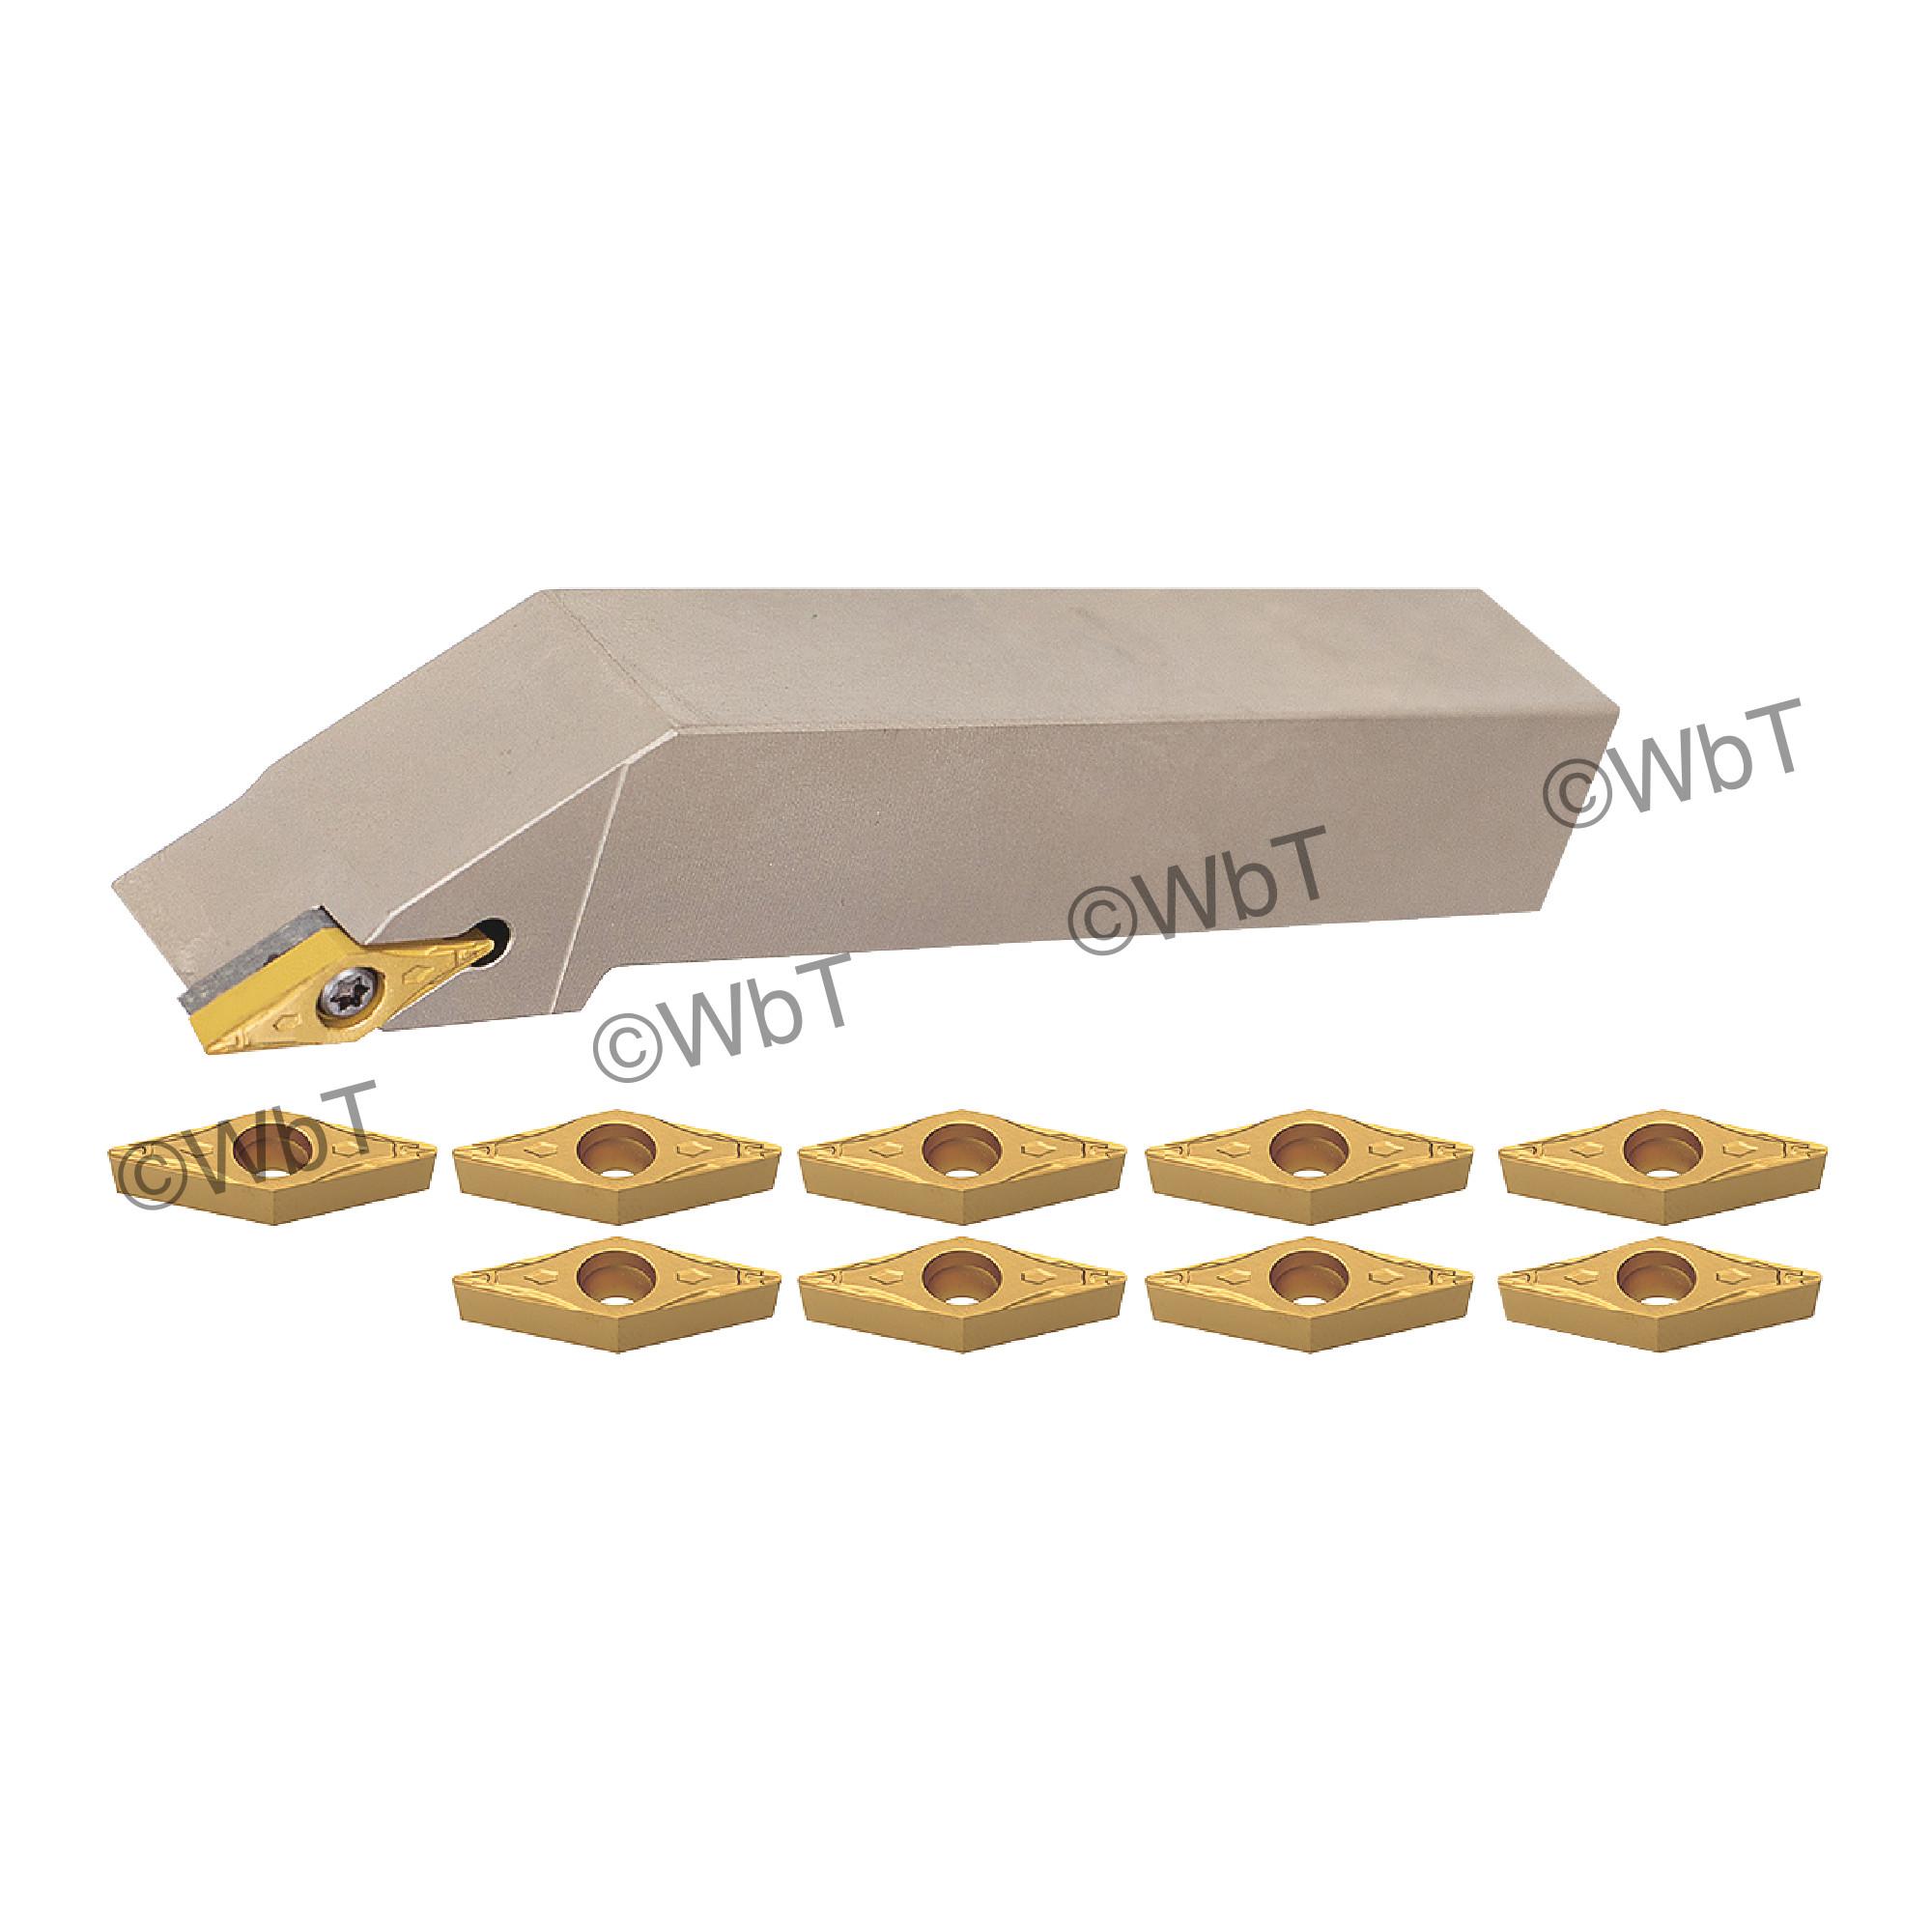 "AKUMA - 3/8"" Turning Set with (1) SVJCR06-2J (3/8"" Holder) & (10) VCMT221-FP1 CT25M Coated Inserts / Right Hand"